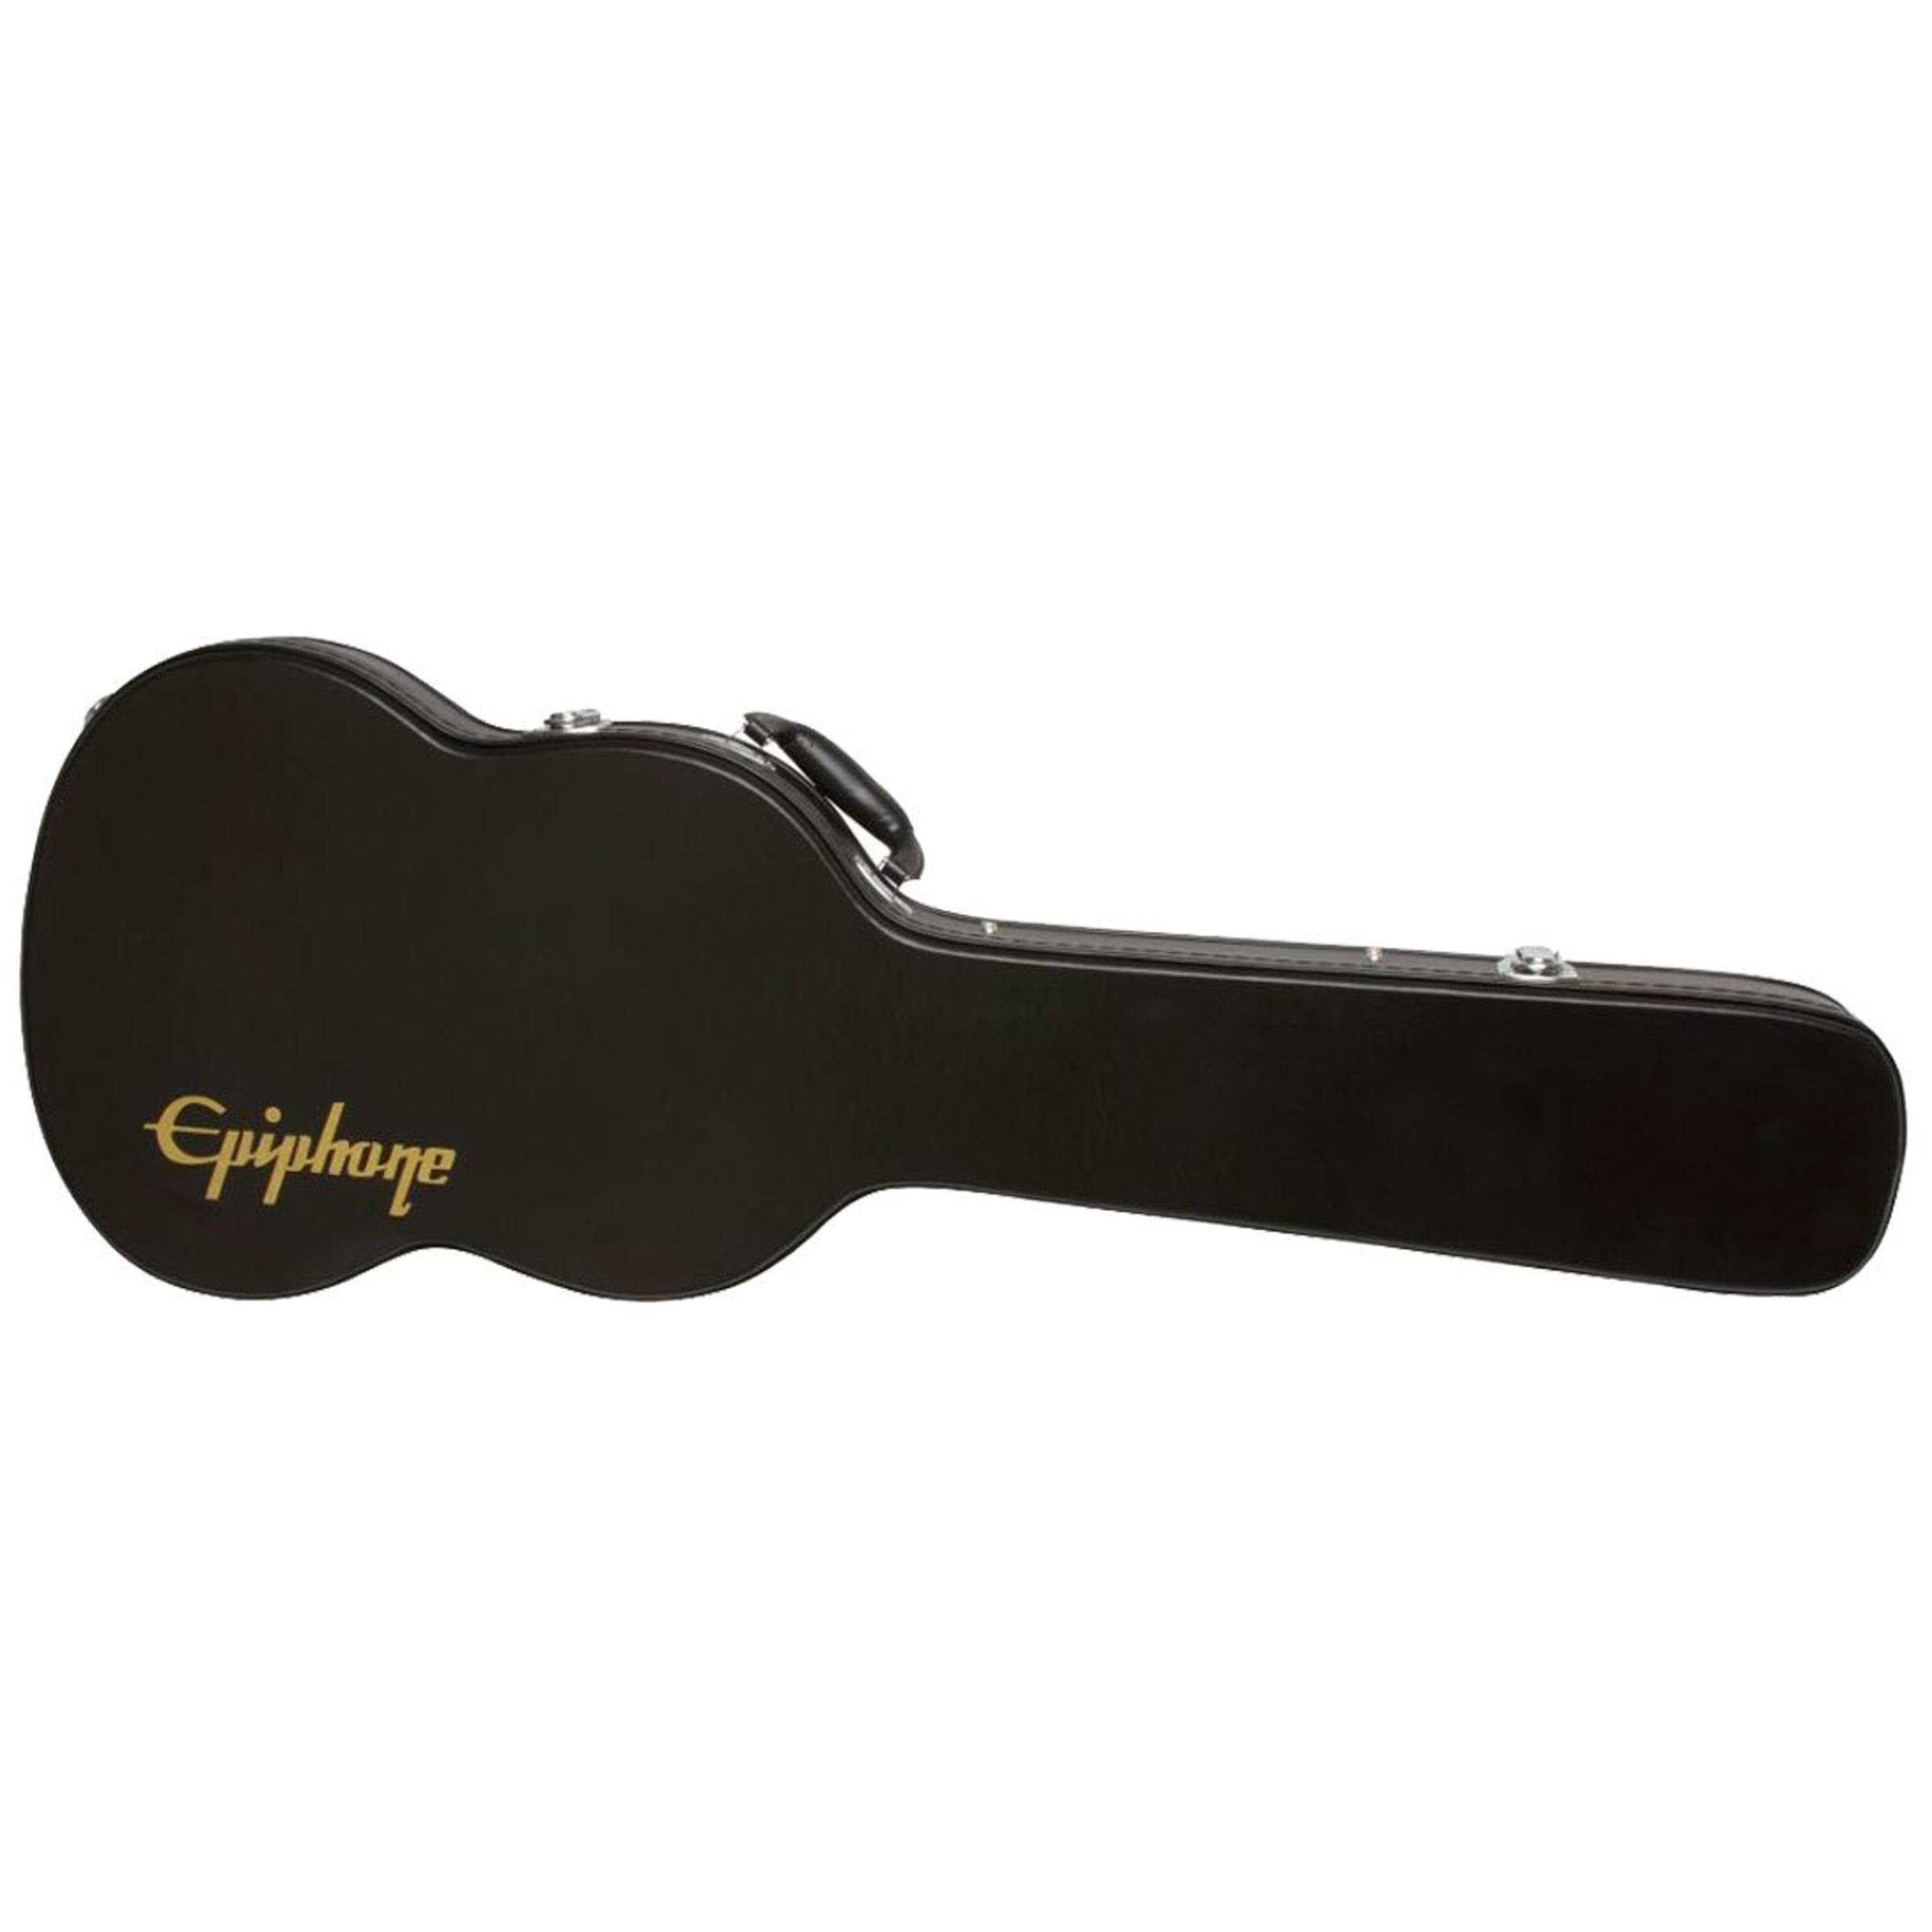 Epiphone Guitar Cases Uk : epiphone ej200 jumbo hard case 940 ejumbo giggear ~ Hamham.info Haus und Dekorationen